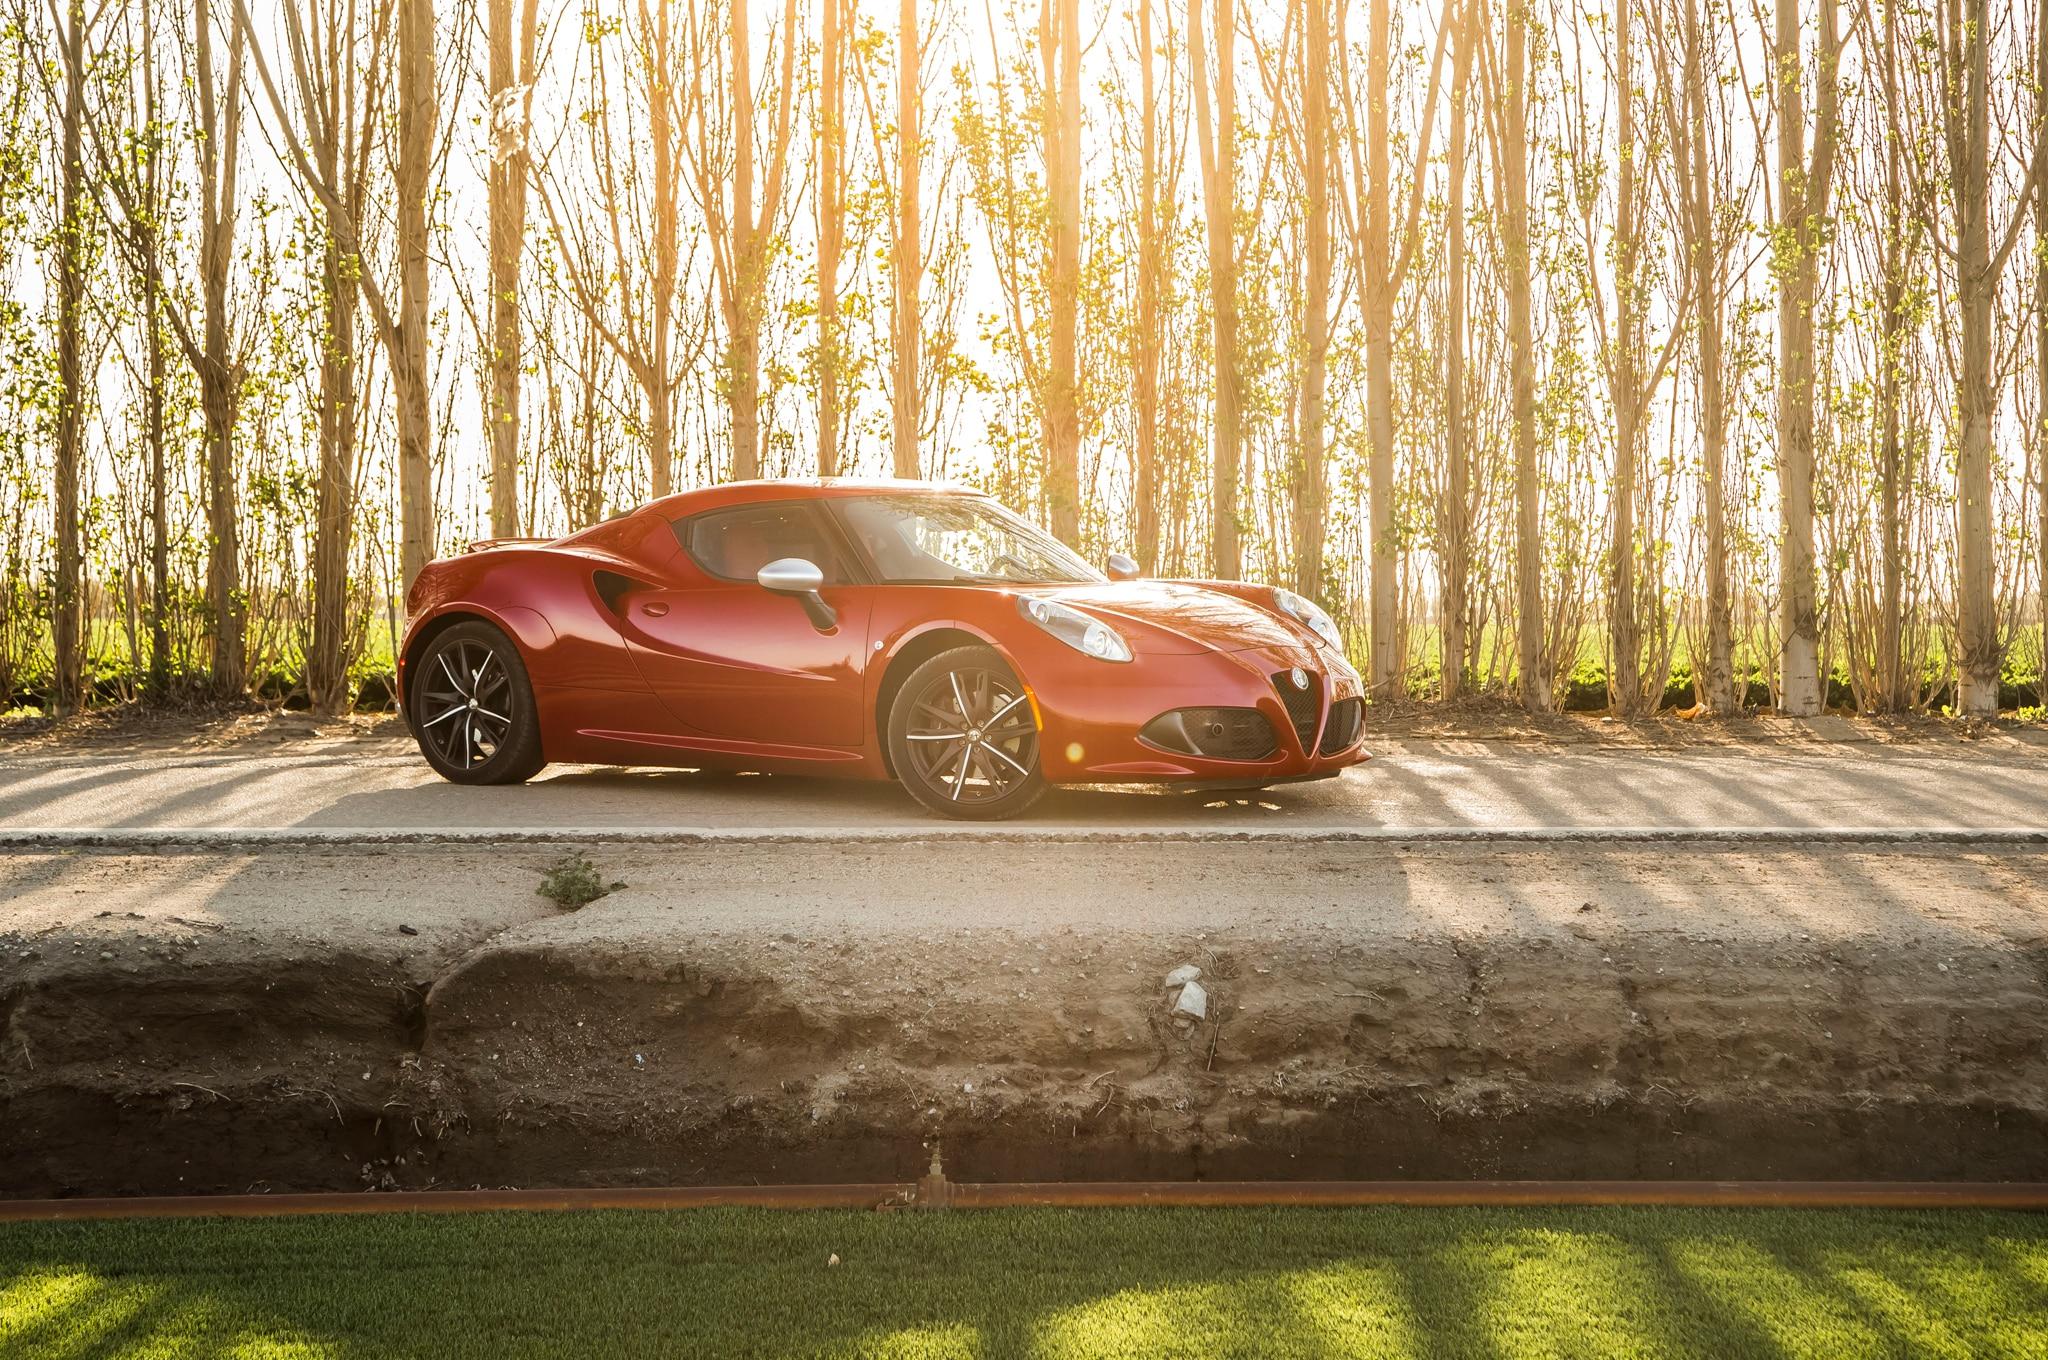 Alfa Romeo 4c Quarter Mile >> 2015 Alfa Romeo 4C Coupe and Alfa Romeo 4C Spider – Four Seasons Wrap-Up | Automobile Magazine